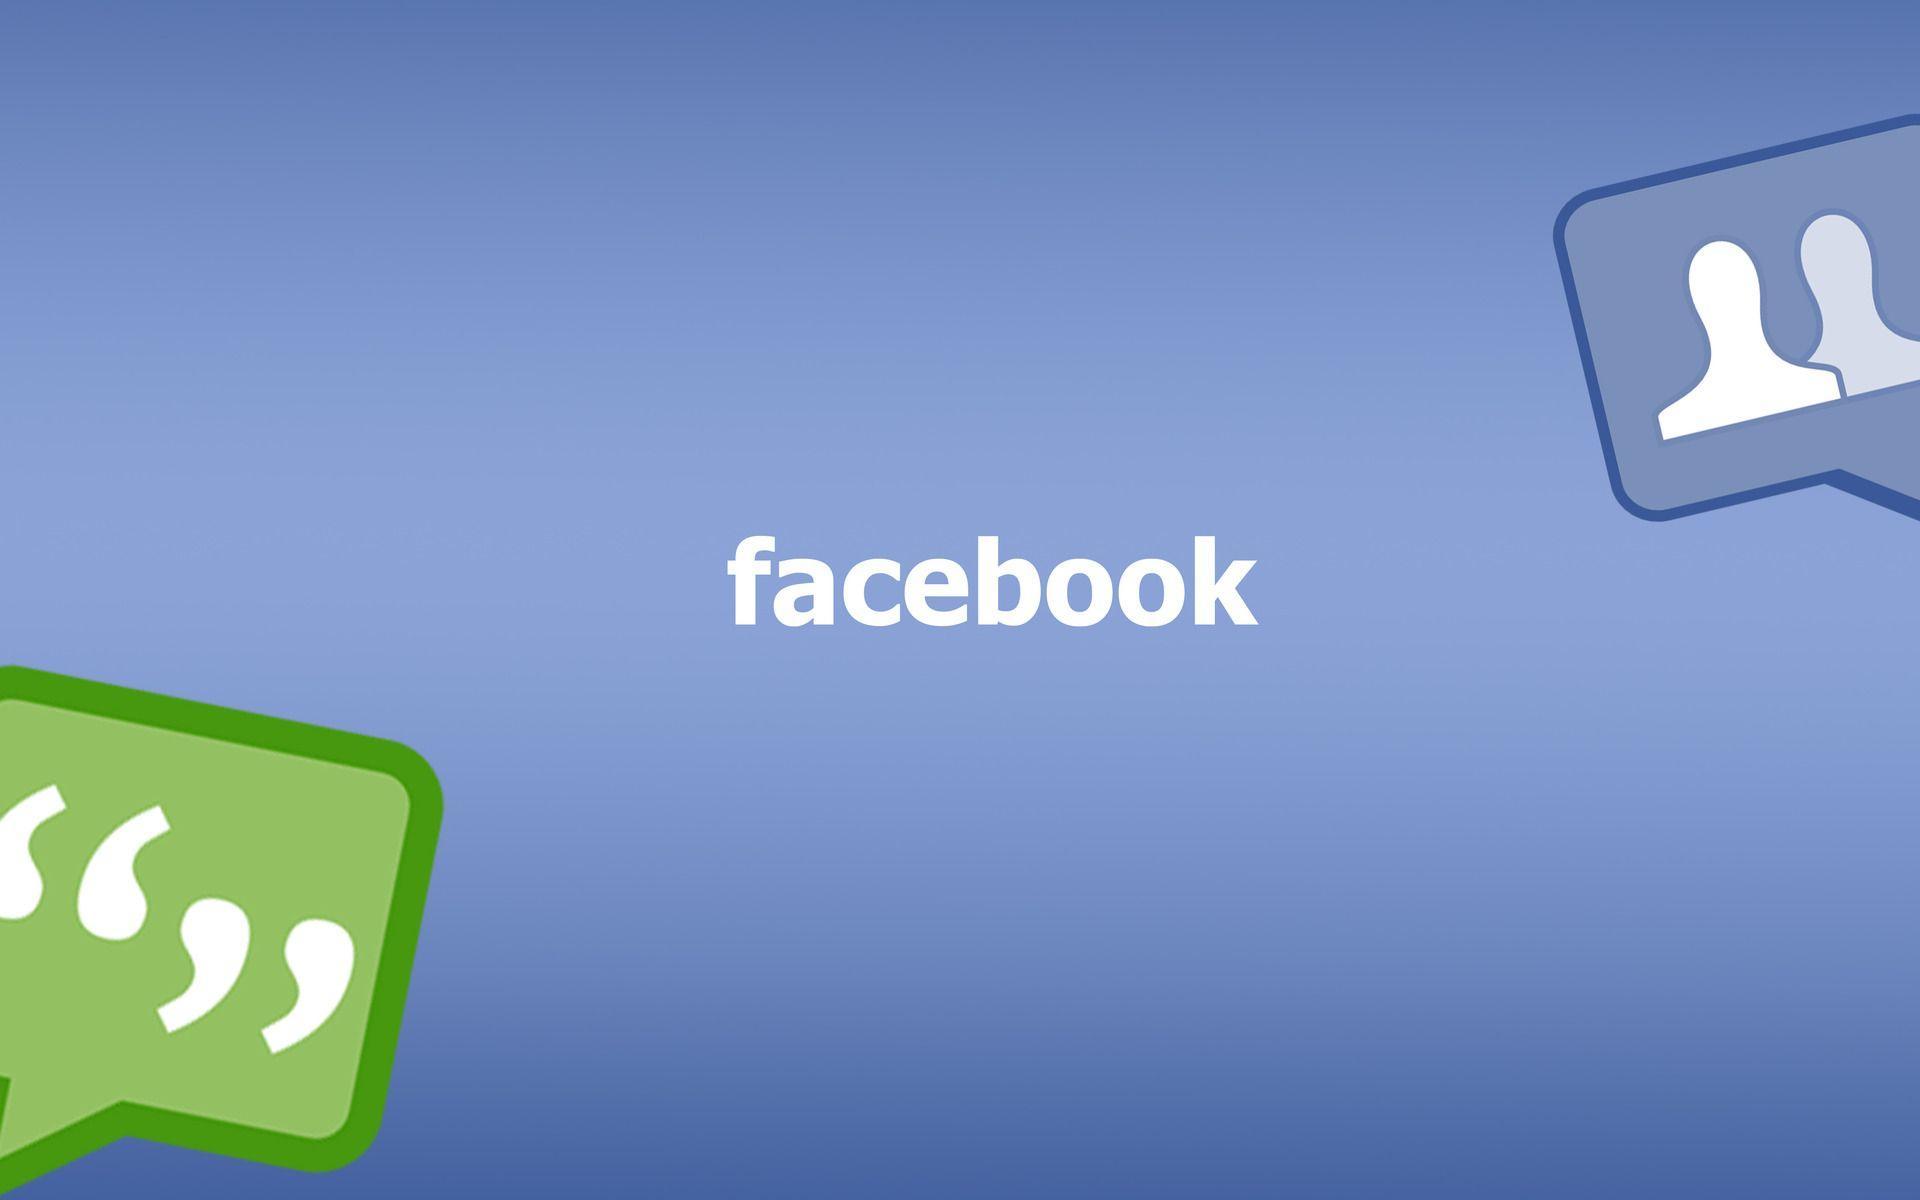 description facebook wallpaper is - photo #15